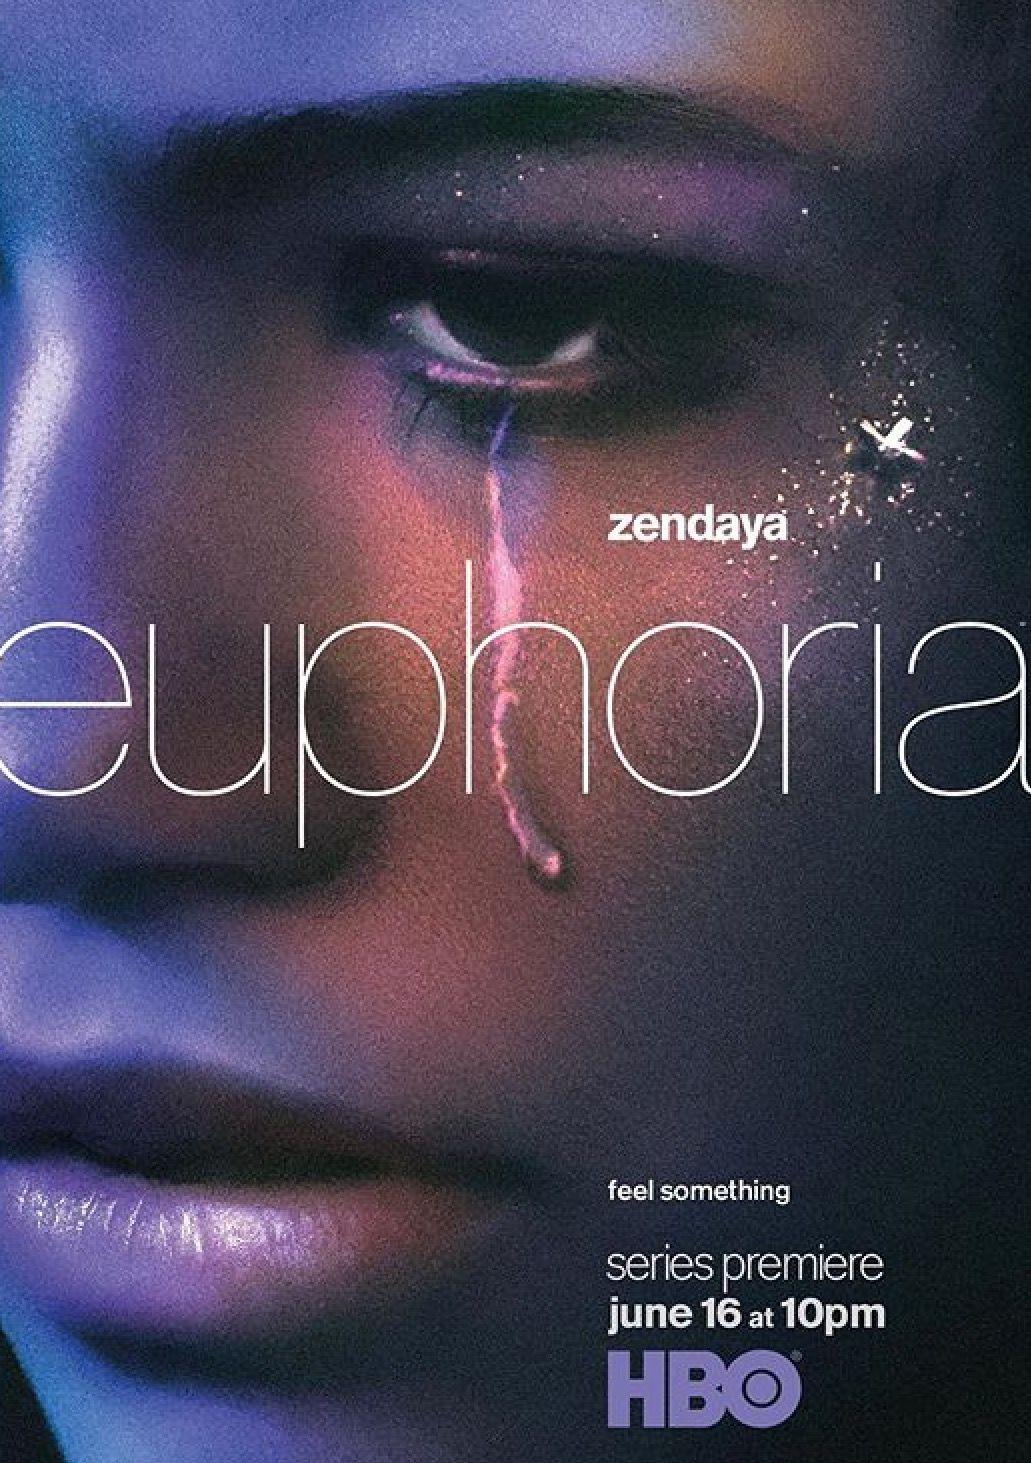 Euphoria Coming On Hbo Series E Filmes Netflix Filmes E